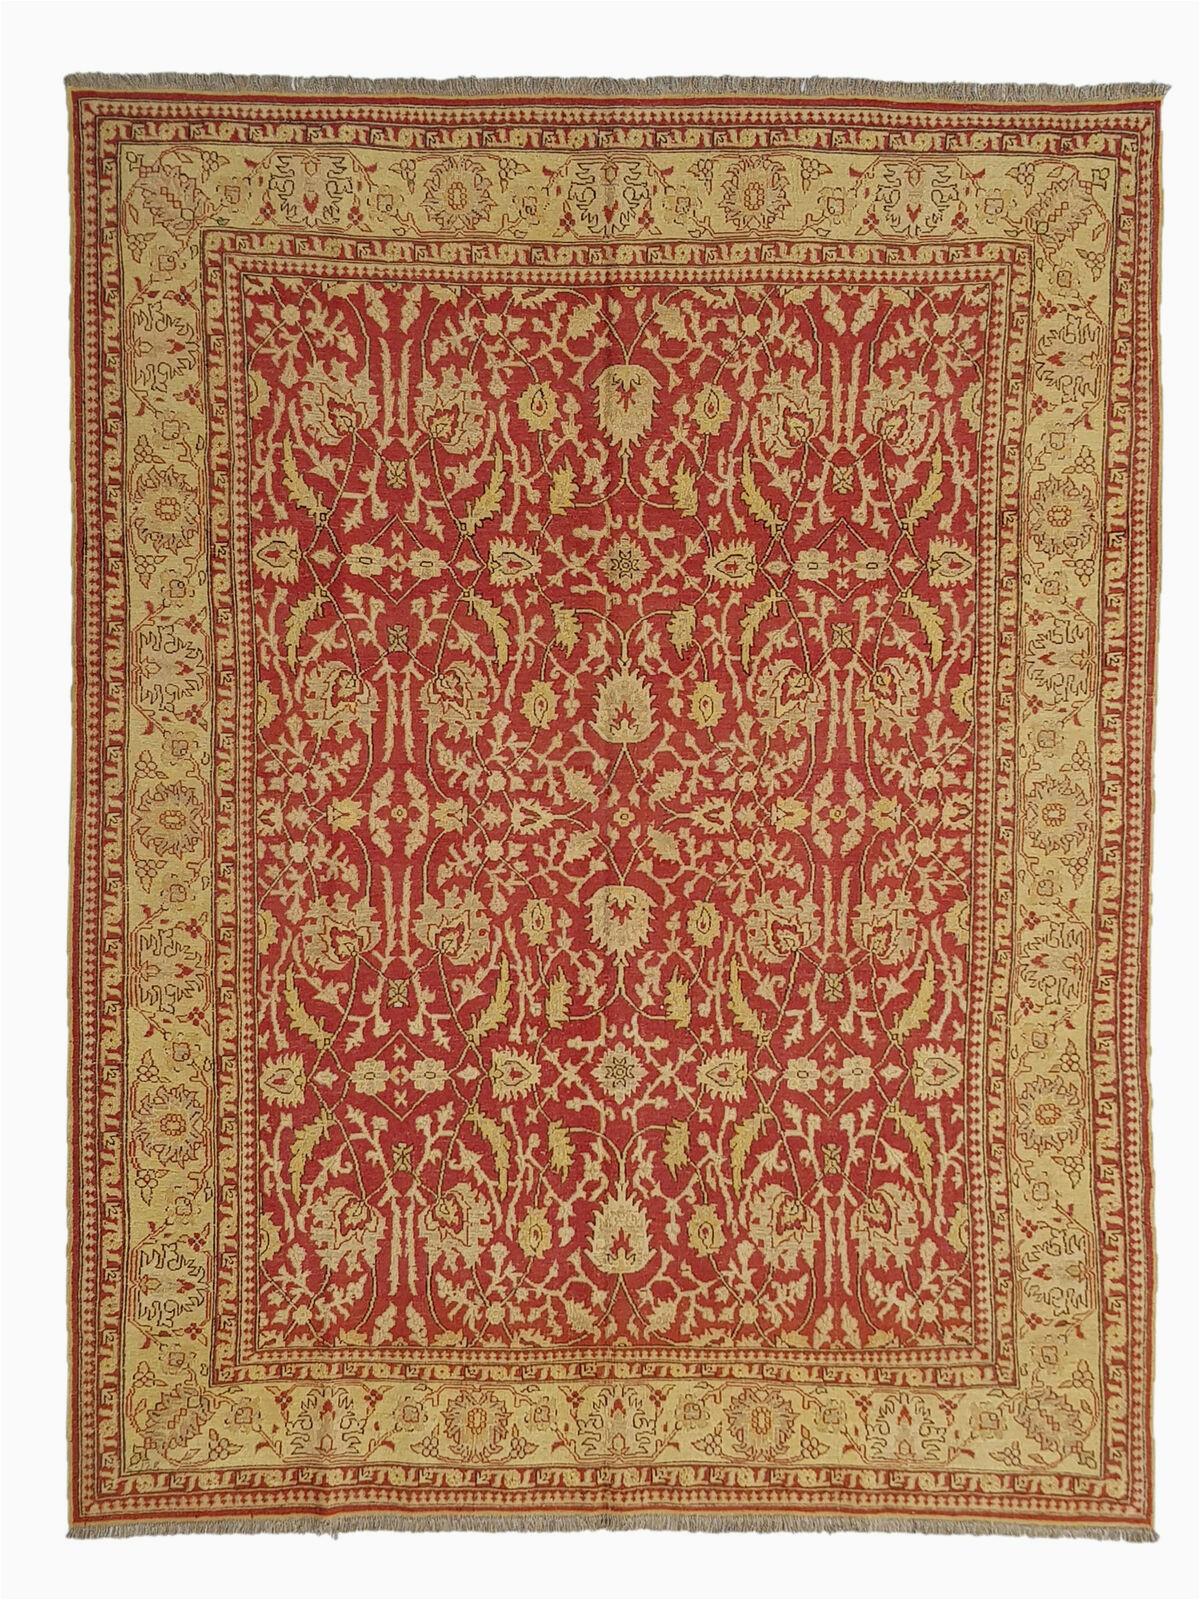 1046x820 antique handmade sumak kilim area rug fla